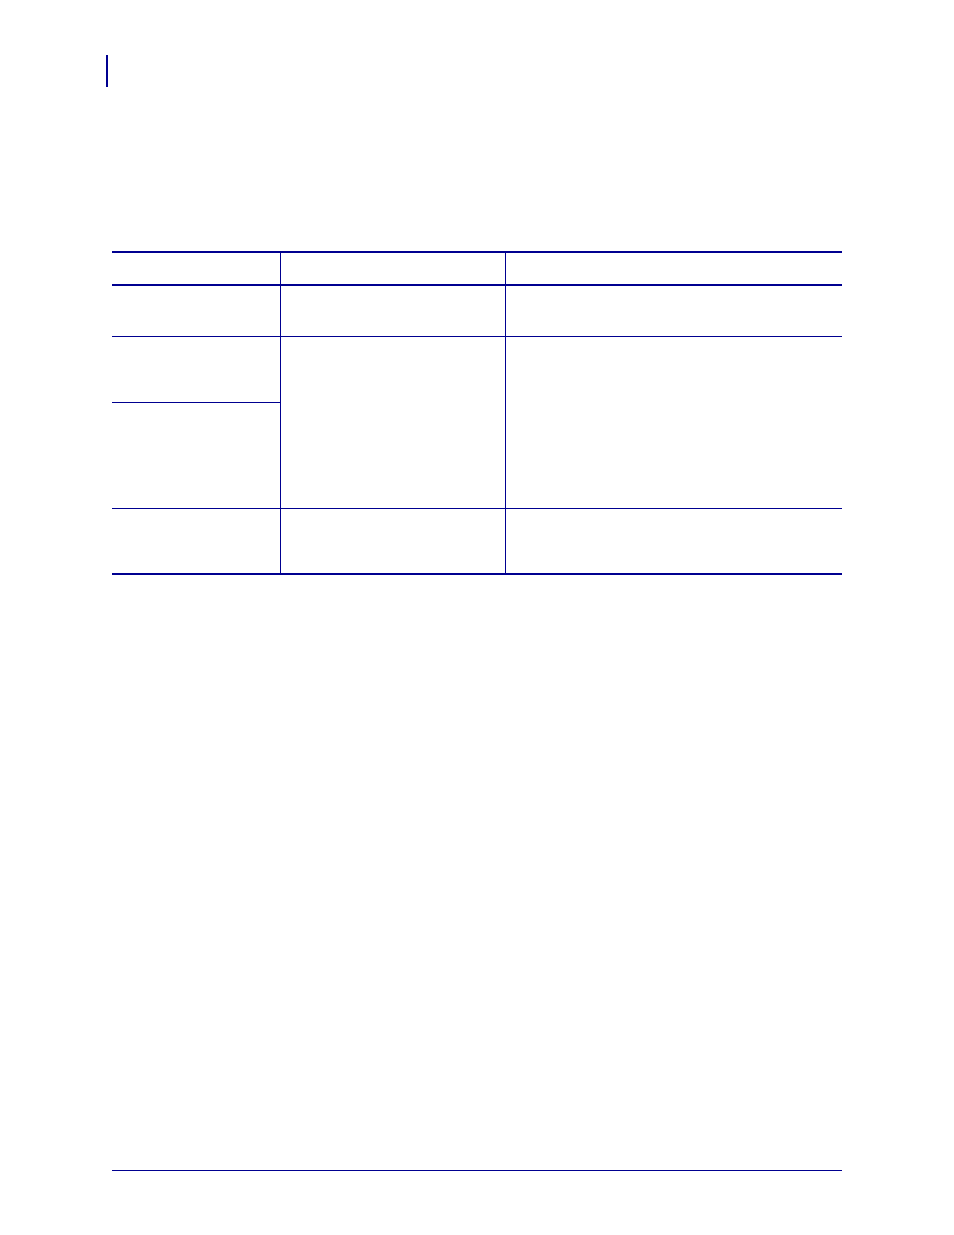 Ribbon problems | Zebra ZM400 User Manual | Page 118 / 146